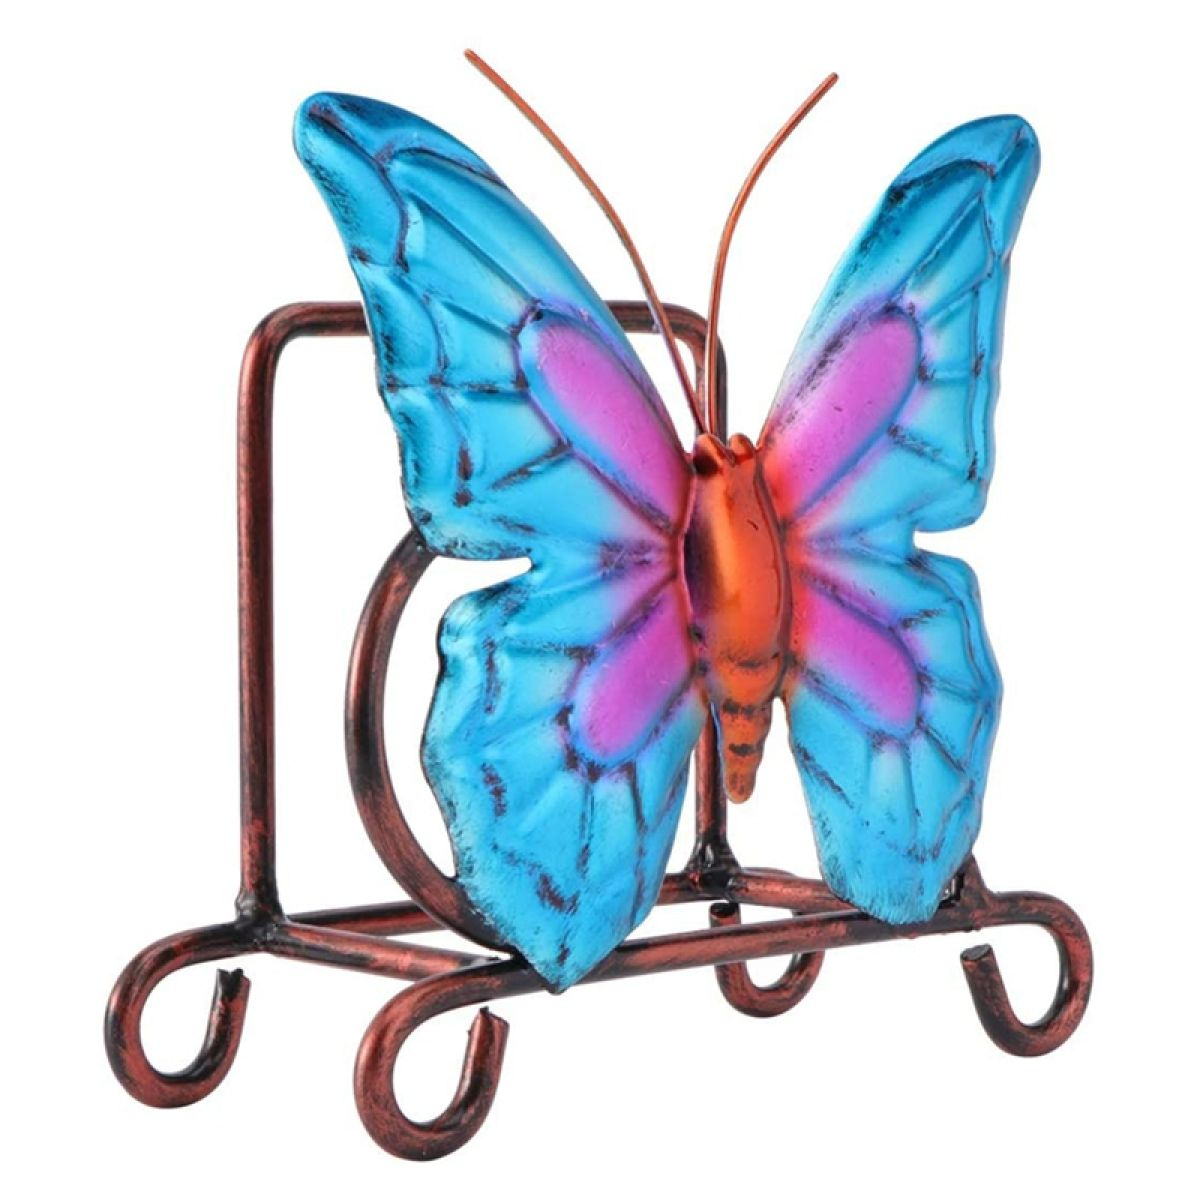 Metal Napkin Holder Butterfly Shaped Tabletop Napkin Holder Freestanding Tissue Dispenser Rustic Dining Table Decor Lazada